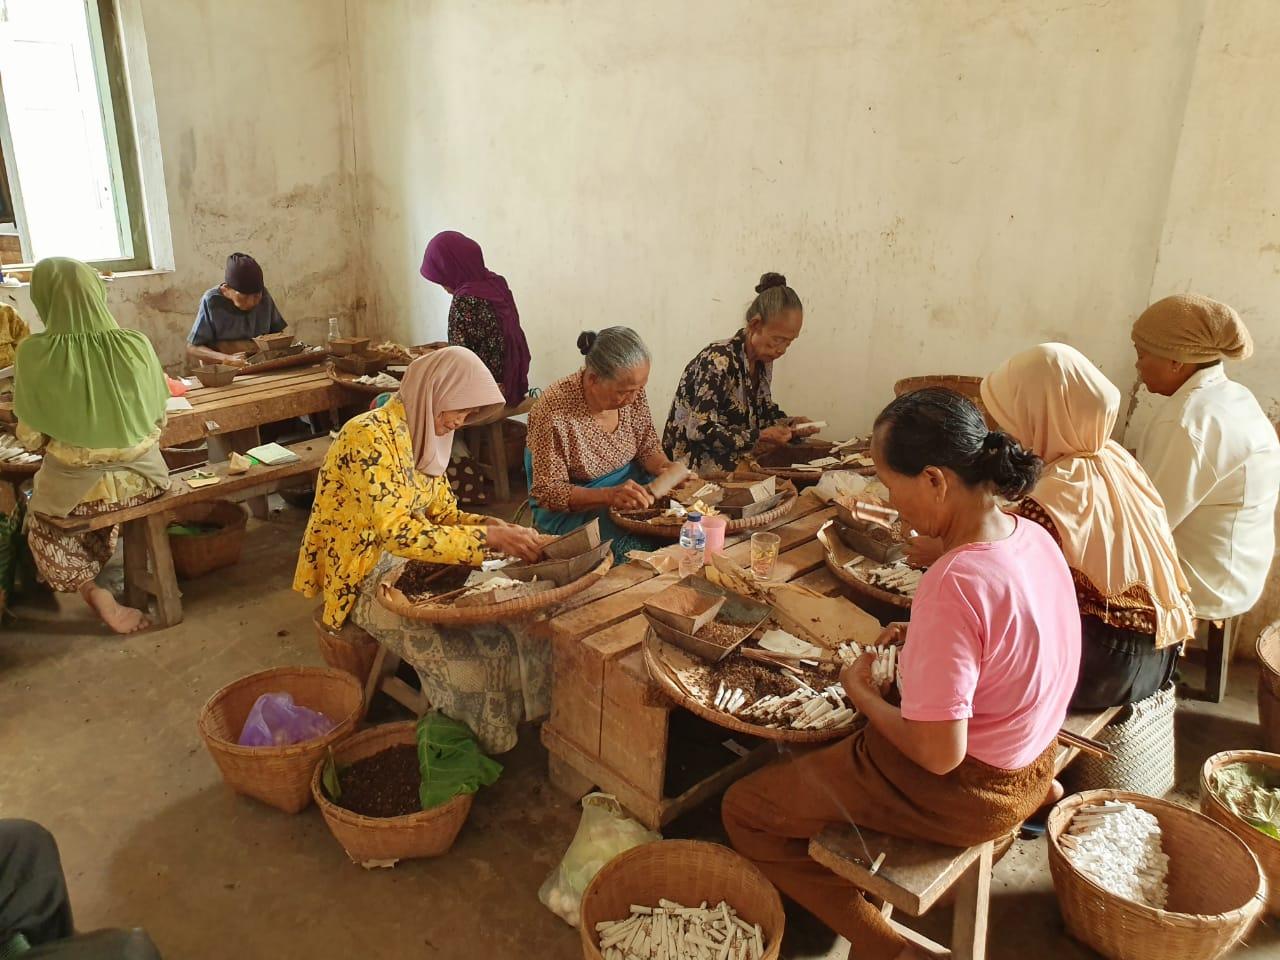 Pekerja pabrik rokok Klembak Menyan | Foto: Della Aniswara/GNFI